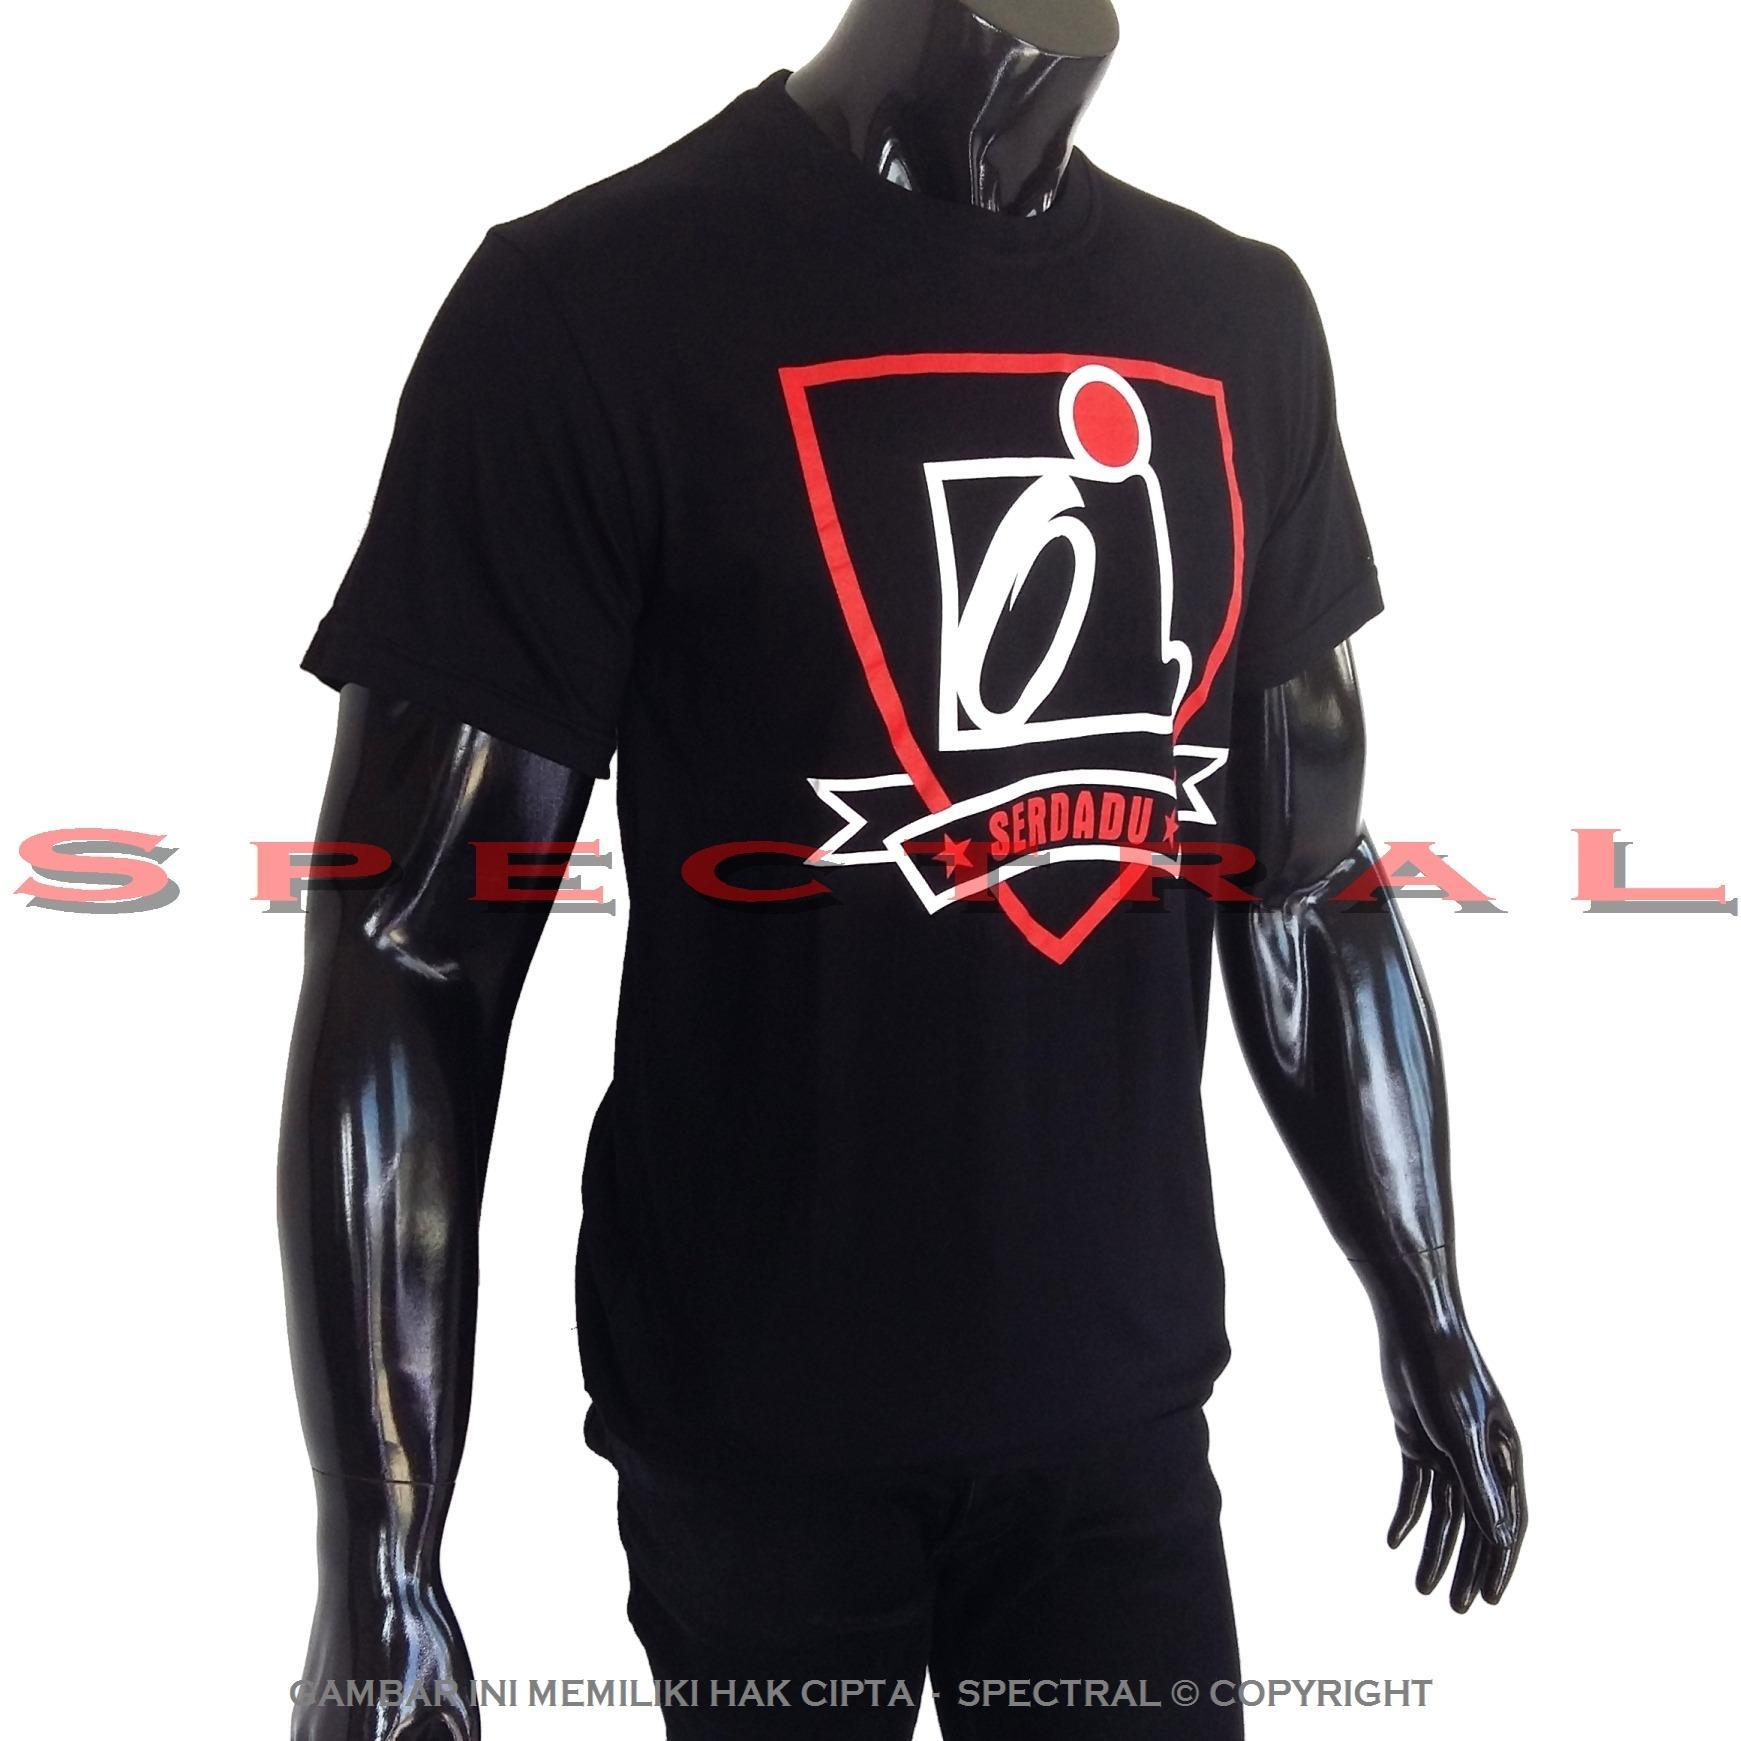 Info Diskon Baru Spectral Iwan Fals Oi Segitiga Serdadu 100 Soft Tshirt Distro Catton Combed 30s Moba Cotton Kaos Fashion